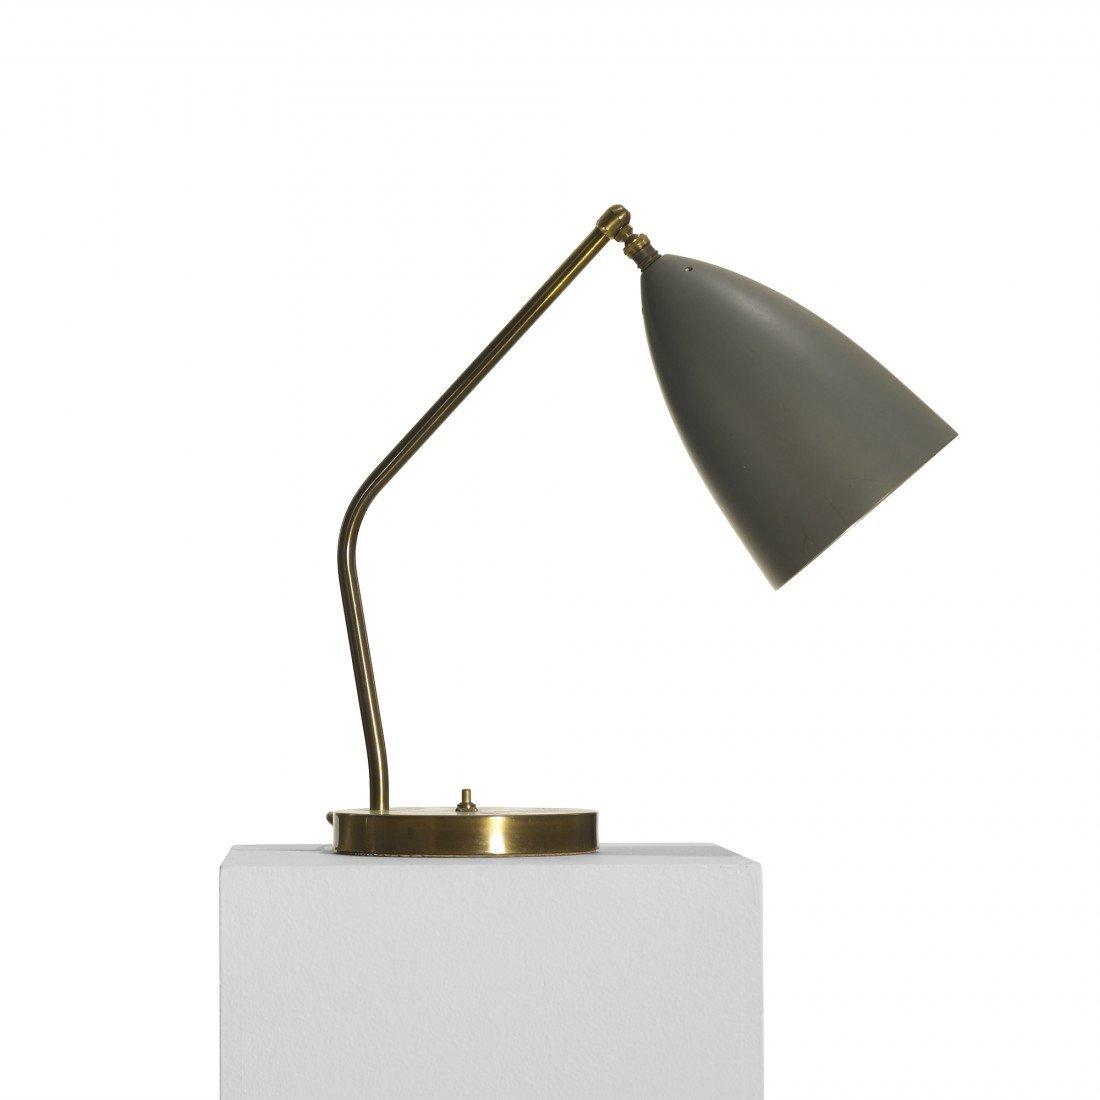 147: Greta  Magnusson Grossman table lamp